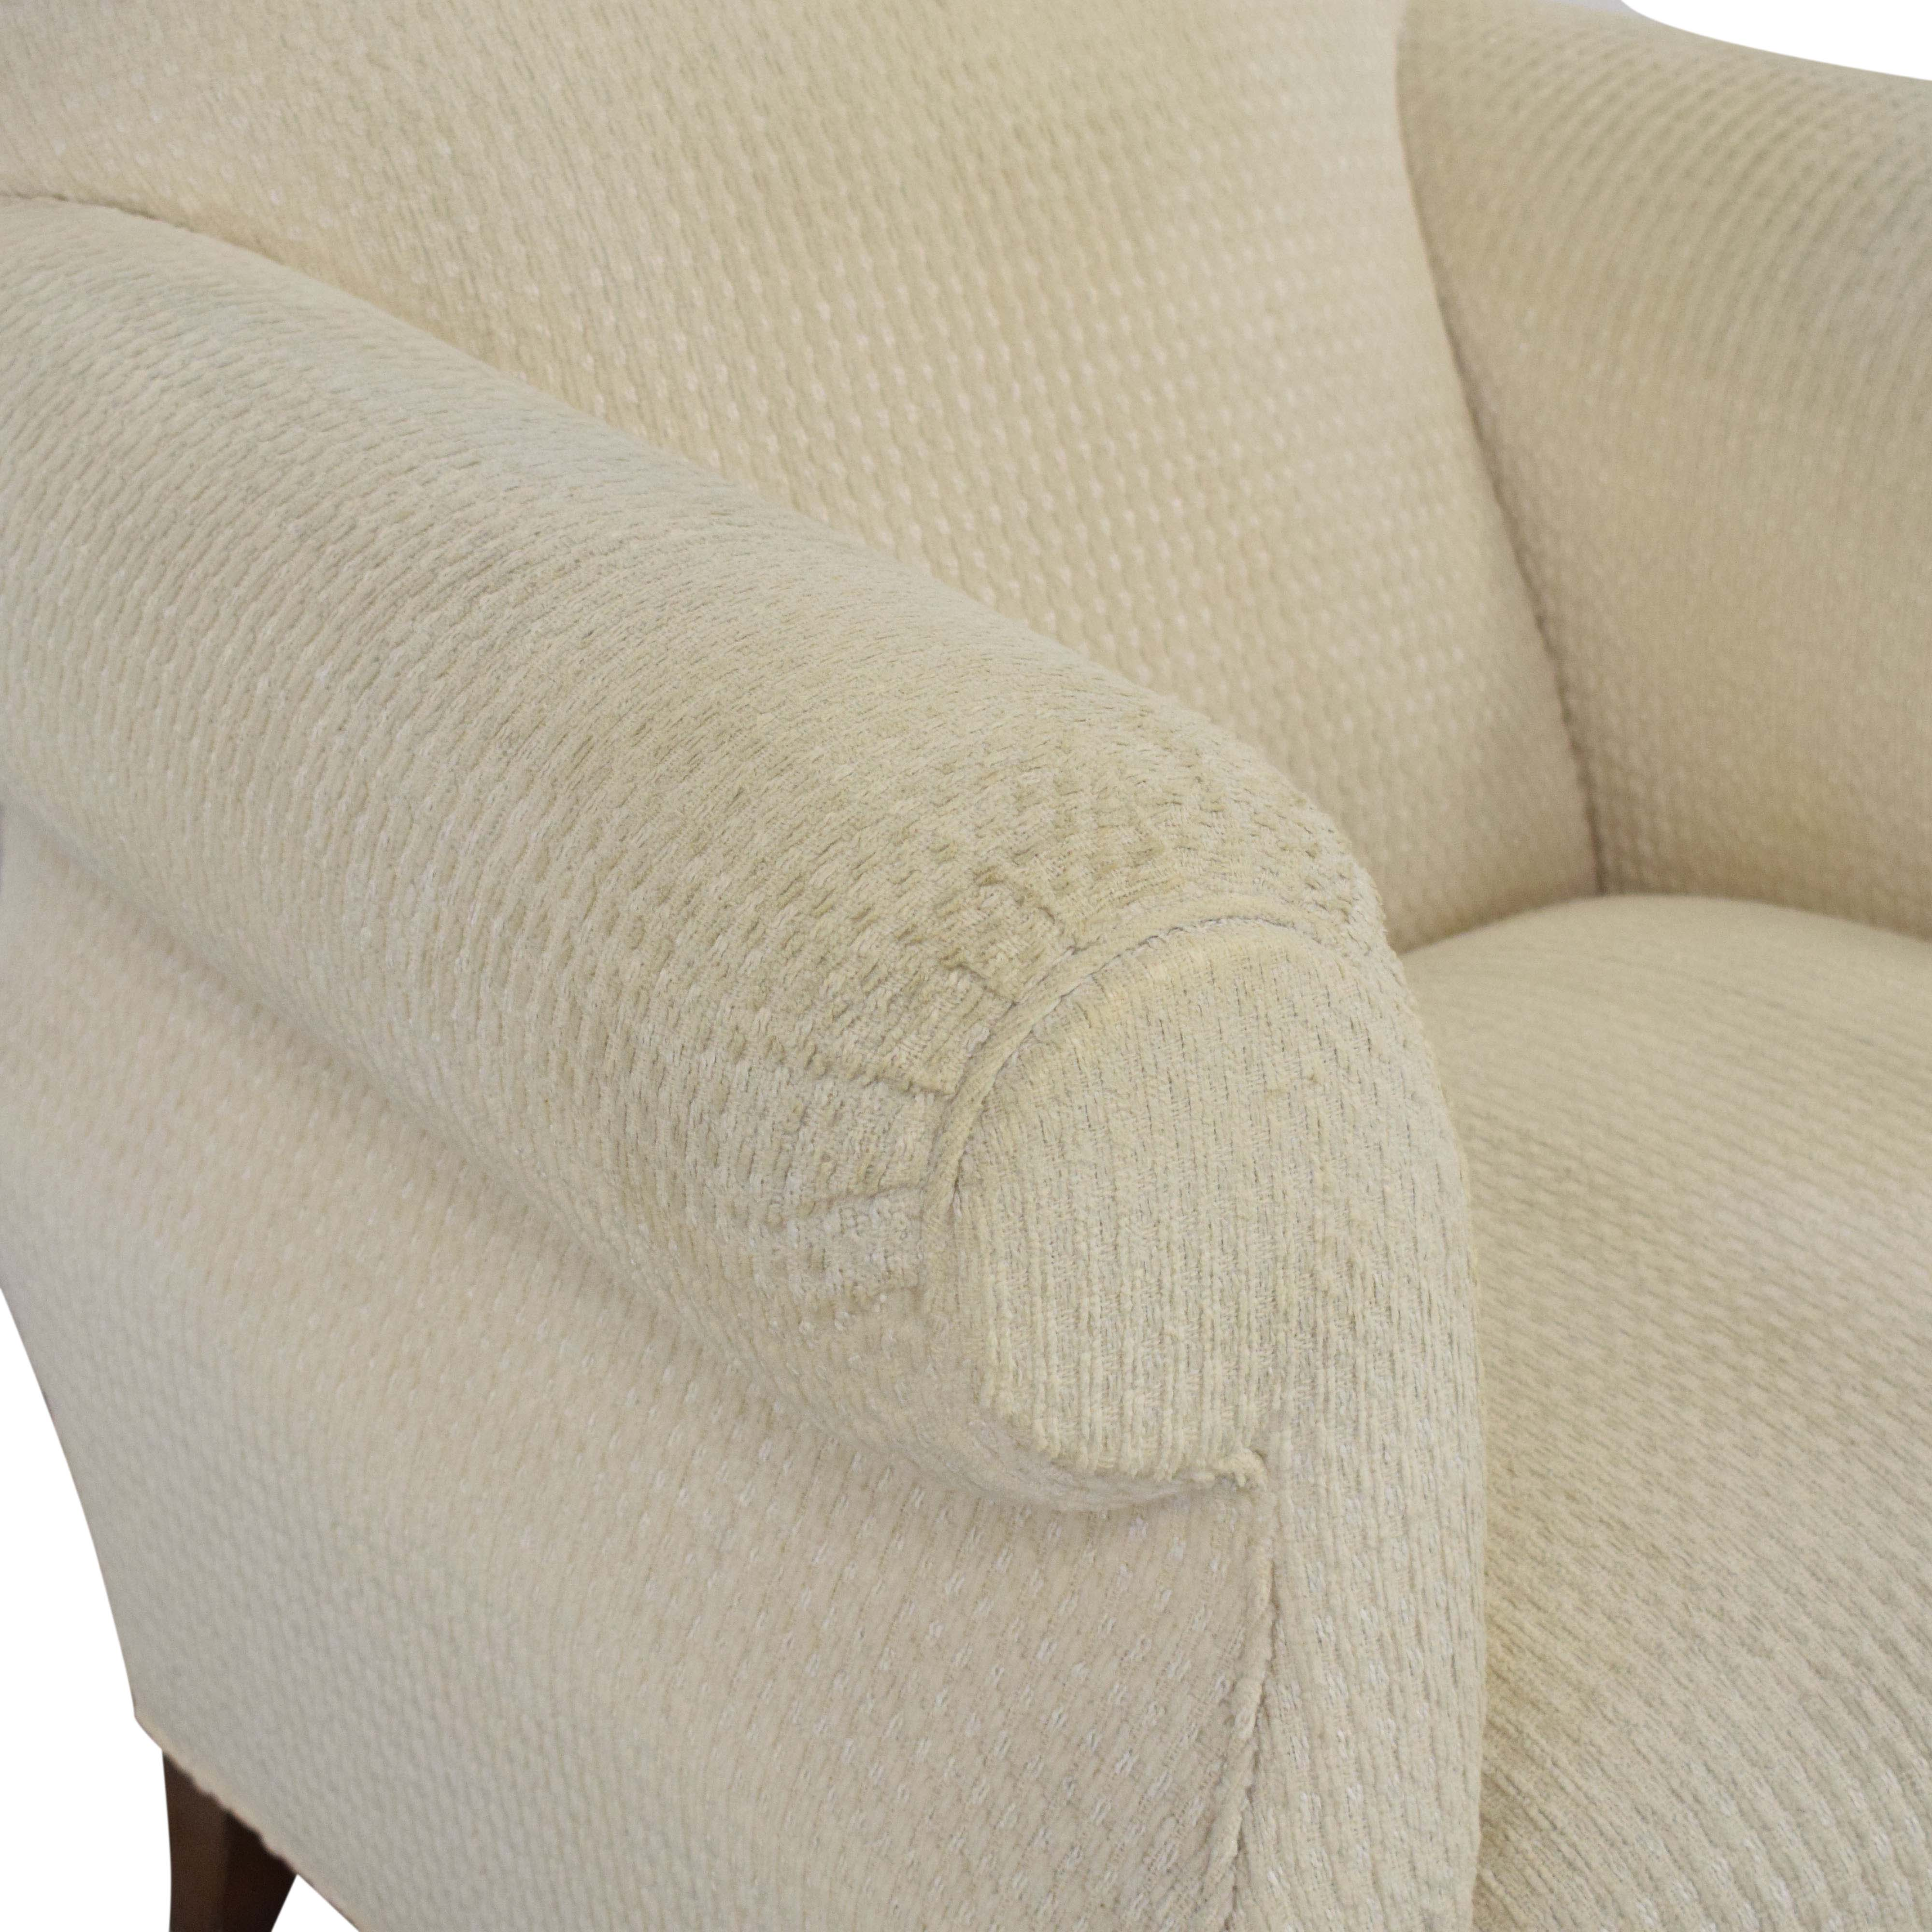 Swaim Swaim Accent Chair price